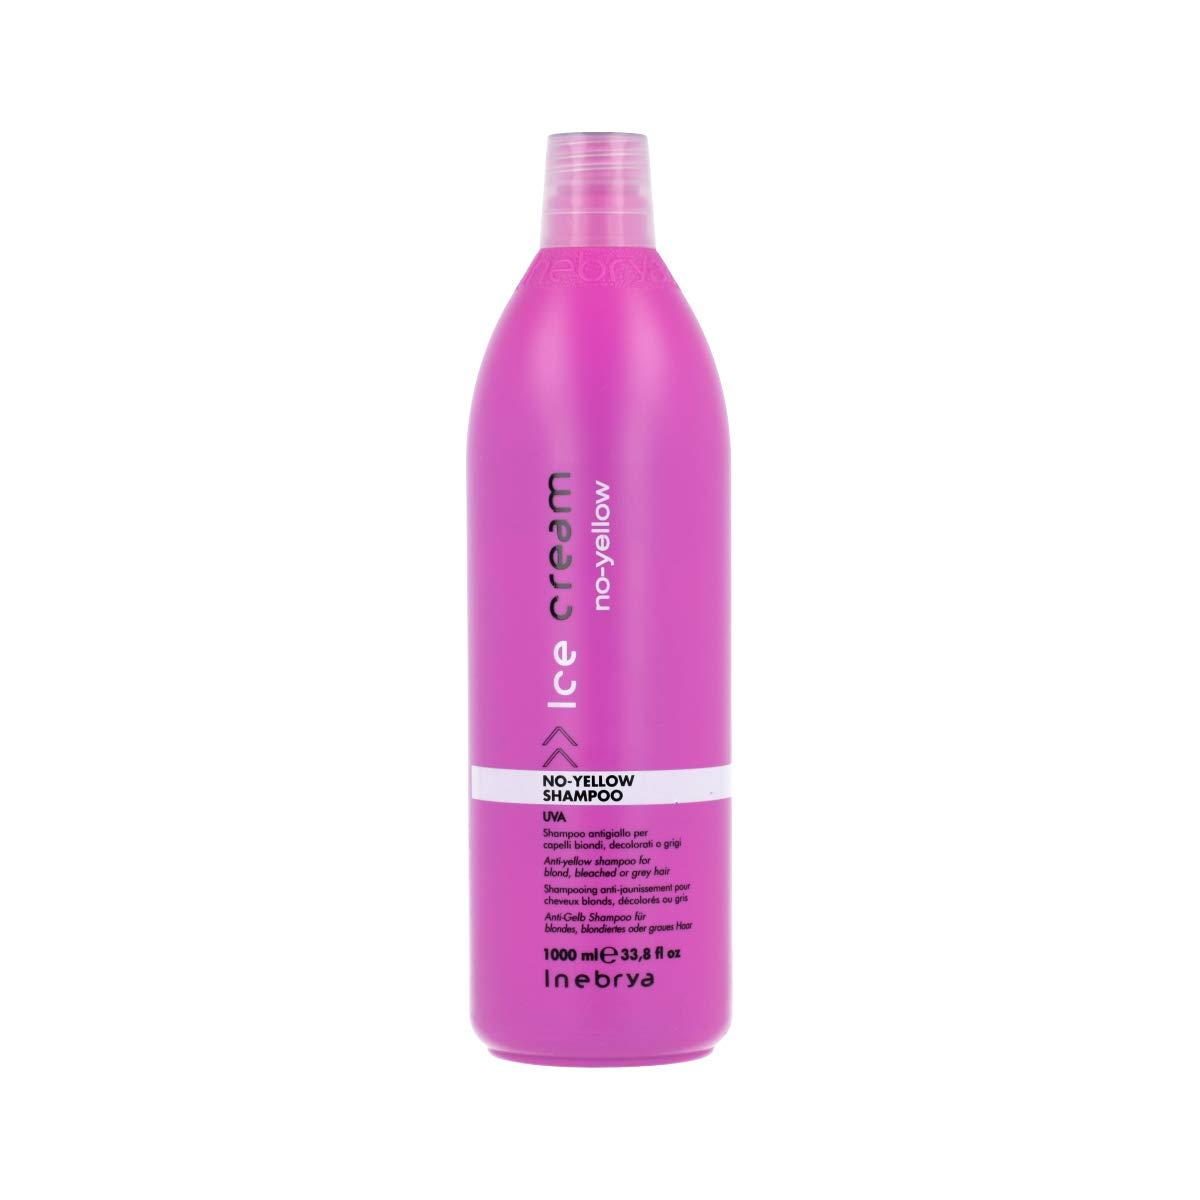 Inebrya NO YELLOW BLEACHED OR GREY HAIR - 1000 ML  Amazon.co.uk  Beauty 3a29809f93b2